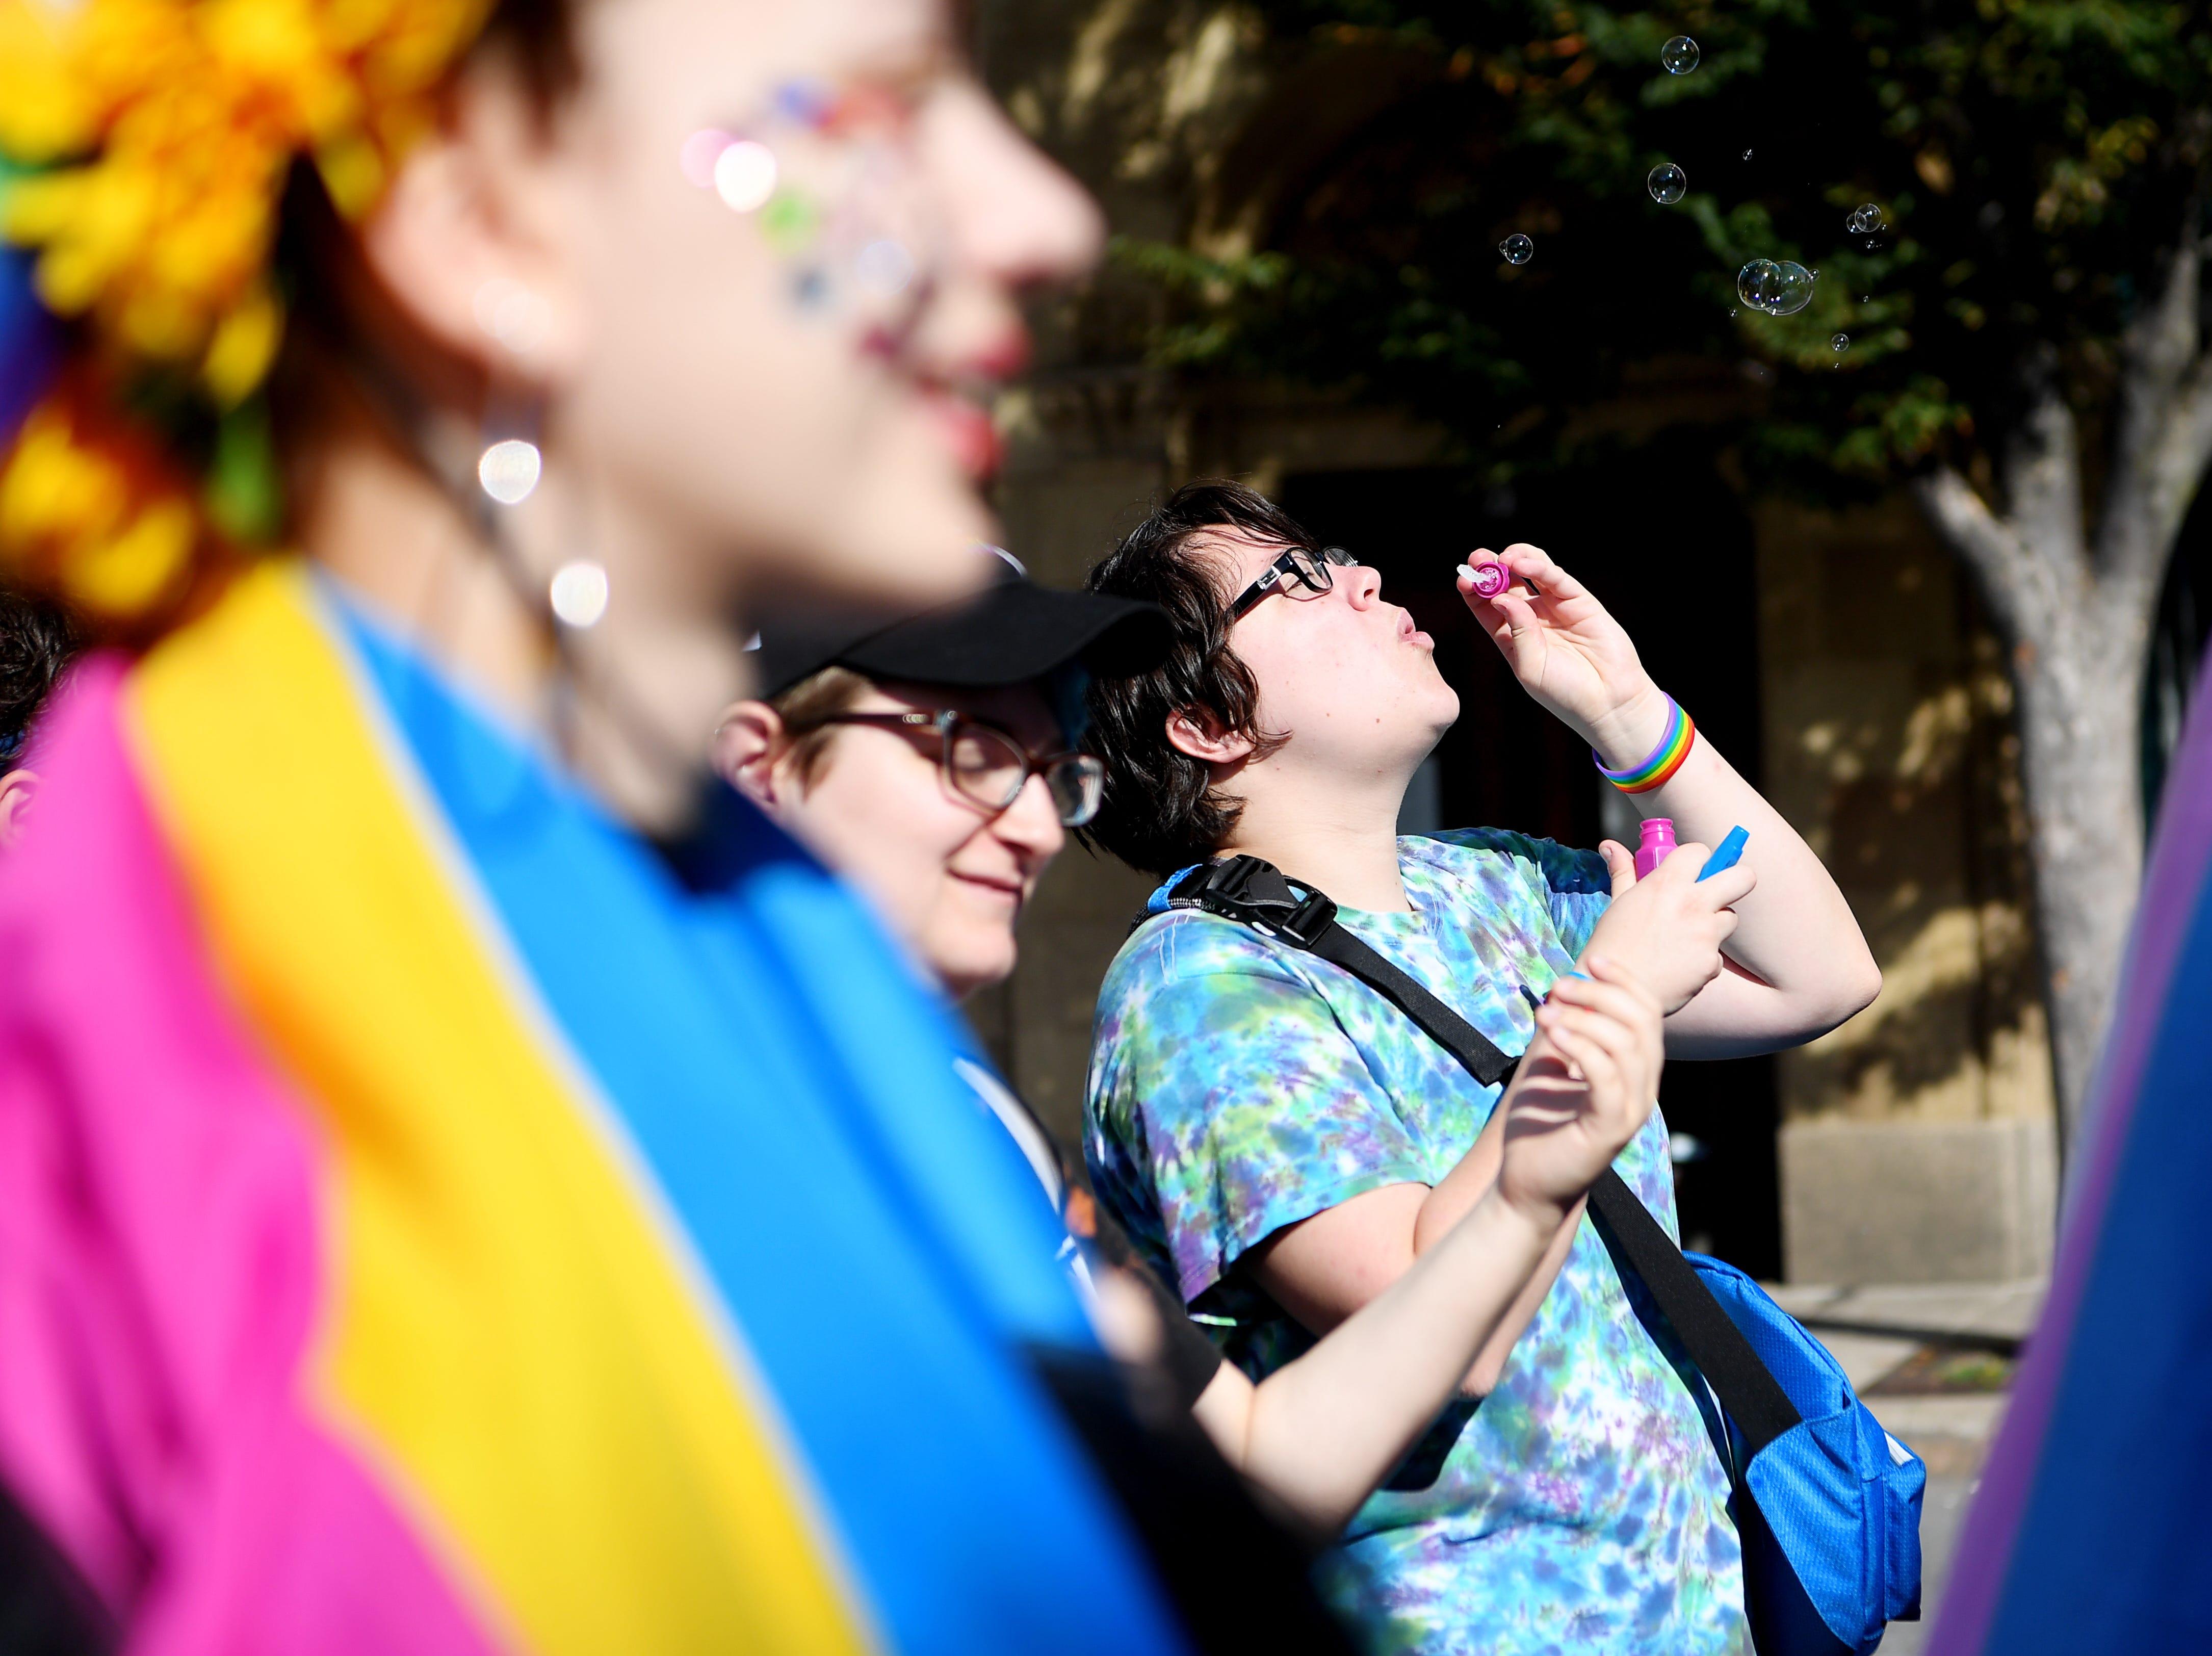 The Blue Ridge Pride procession walks up Patton Avenue to Pack Square Park Sept. 29, 2018 in Asheville.